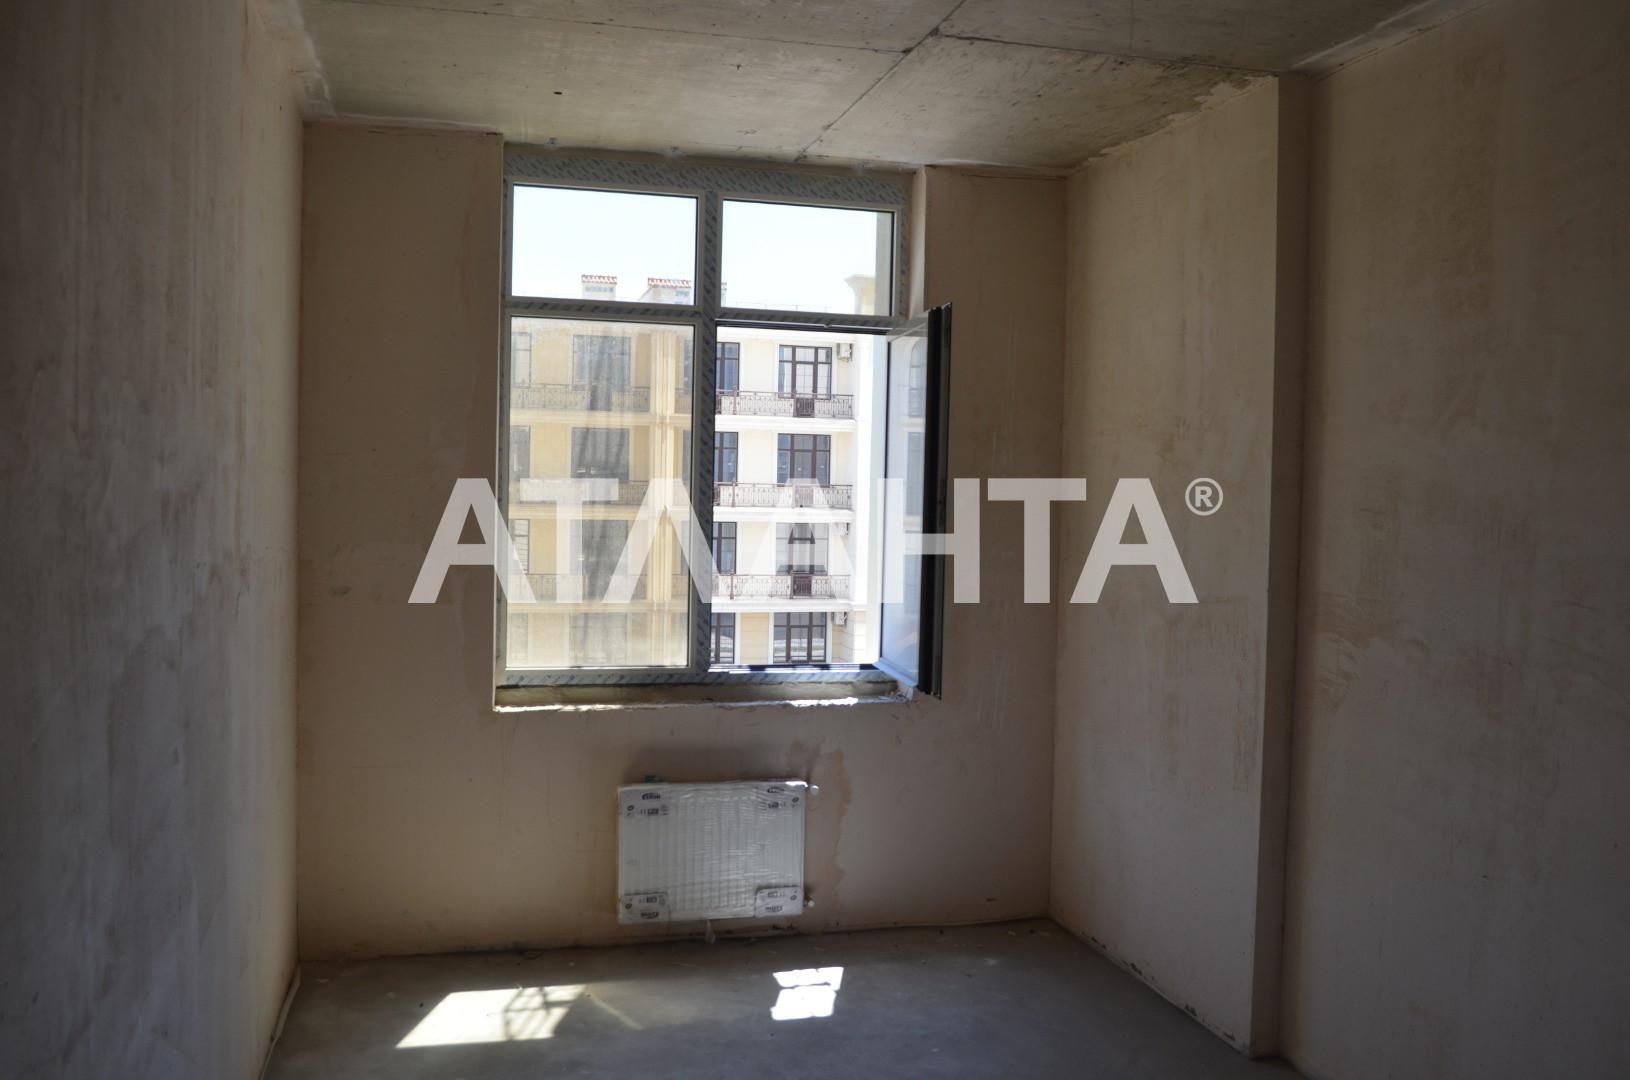 Продается 1-комнатная Квартира на ул. Французский Бул. (Пролетарский Бул.) — 51 000 у.е. (фото №2)